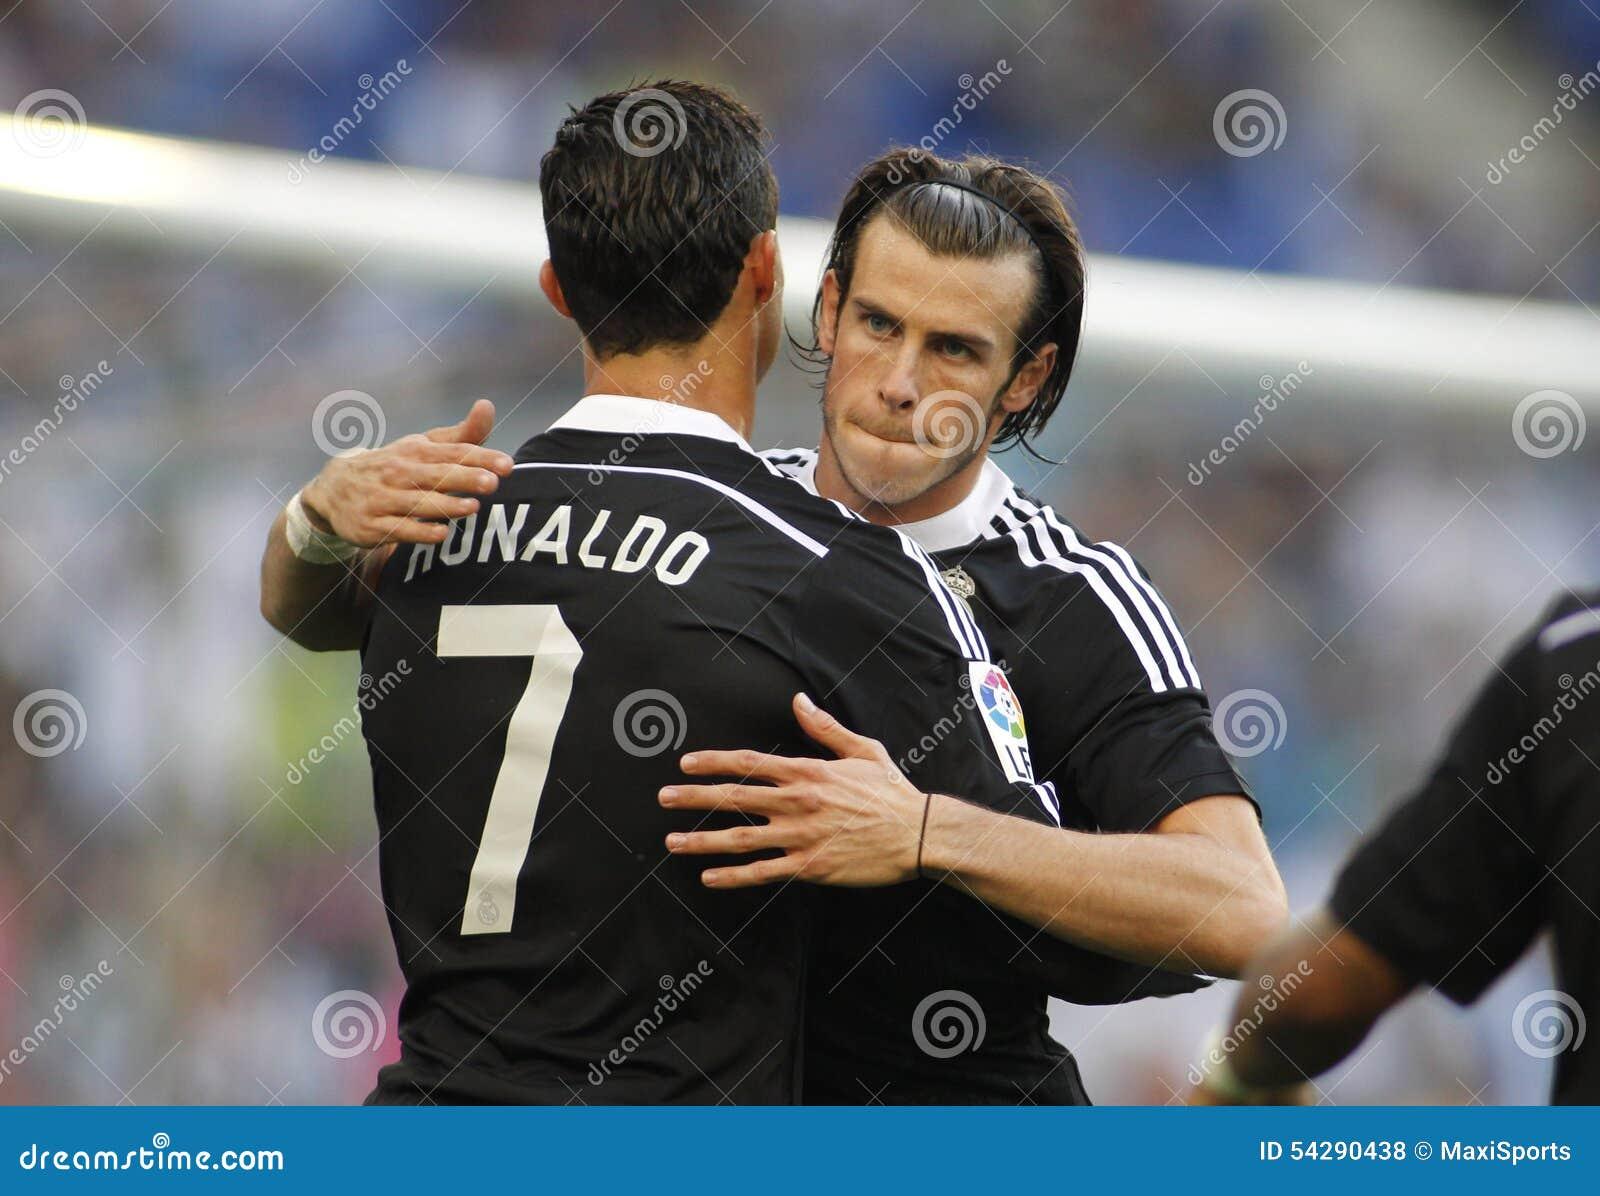 Cristiano Ronaldo and Gareth Bale of Real Madrid